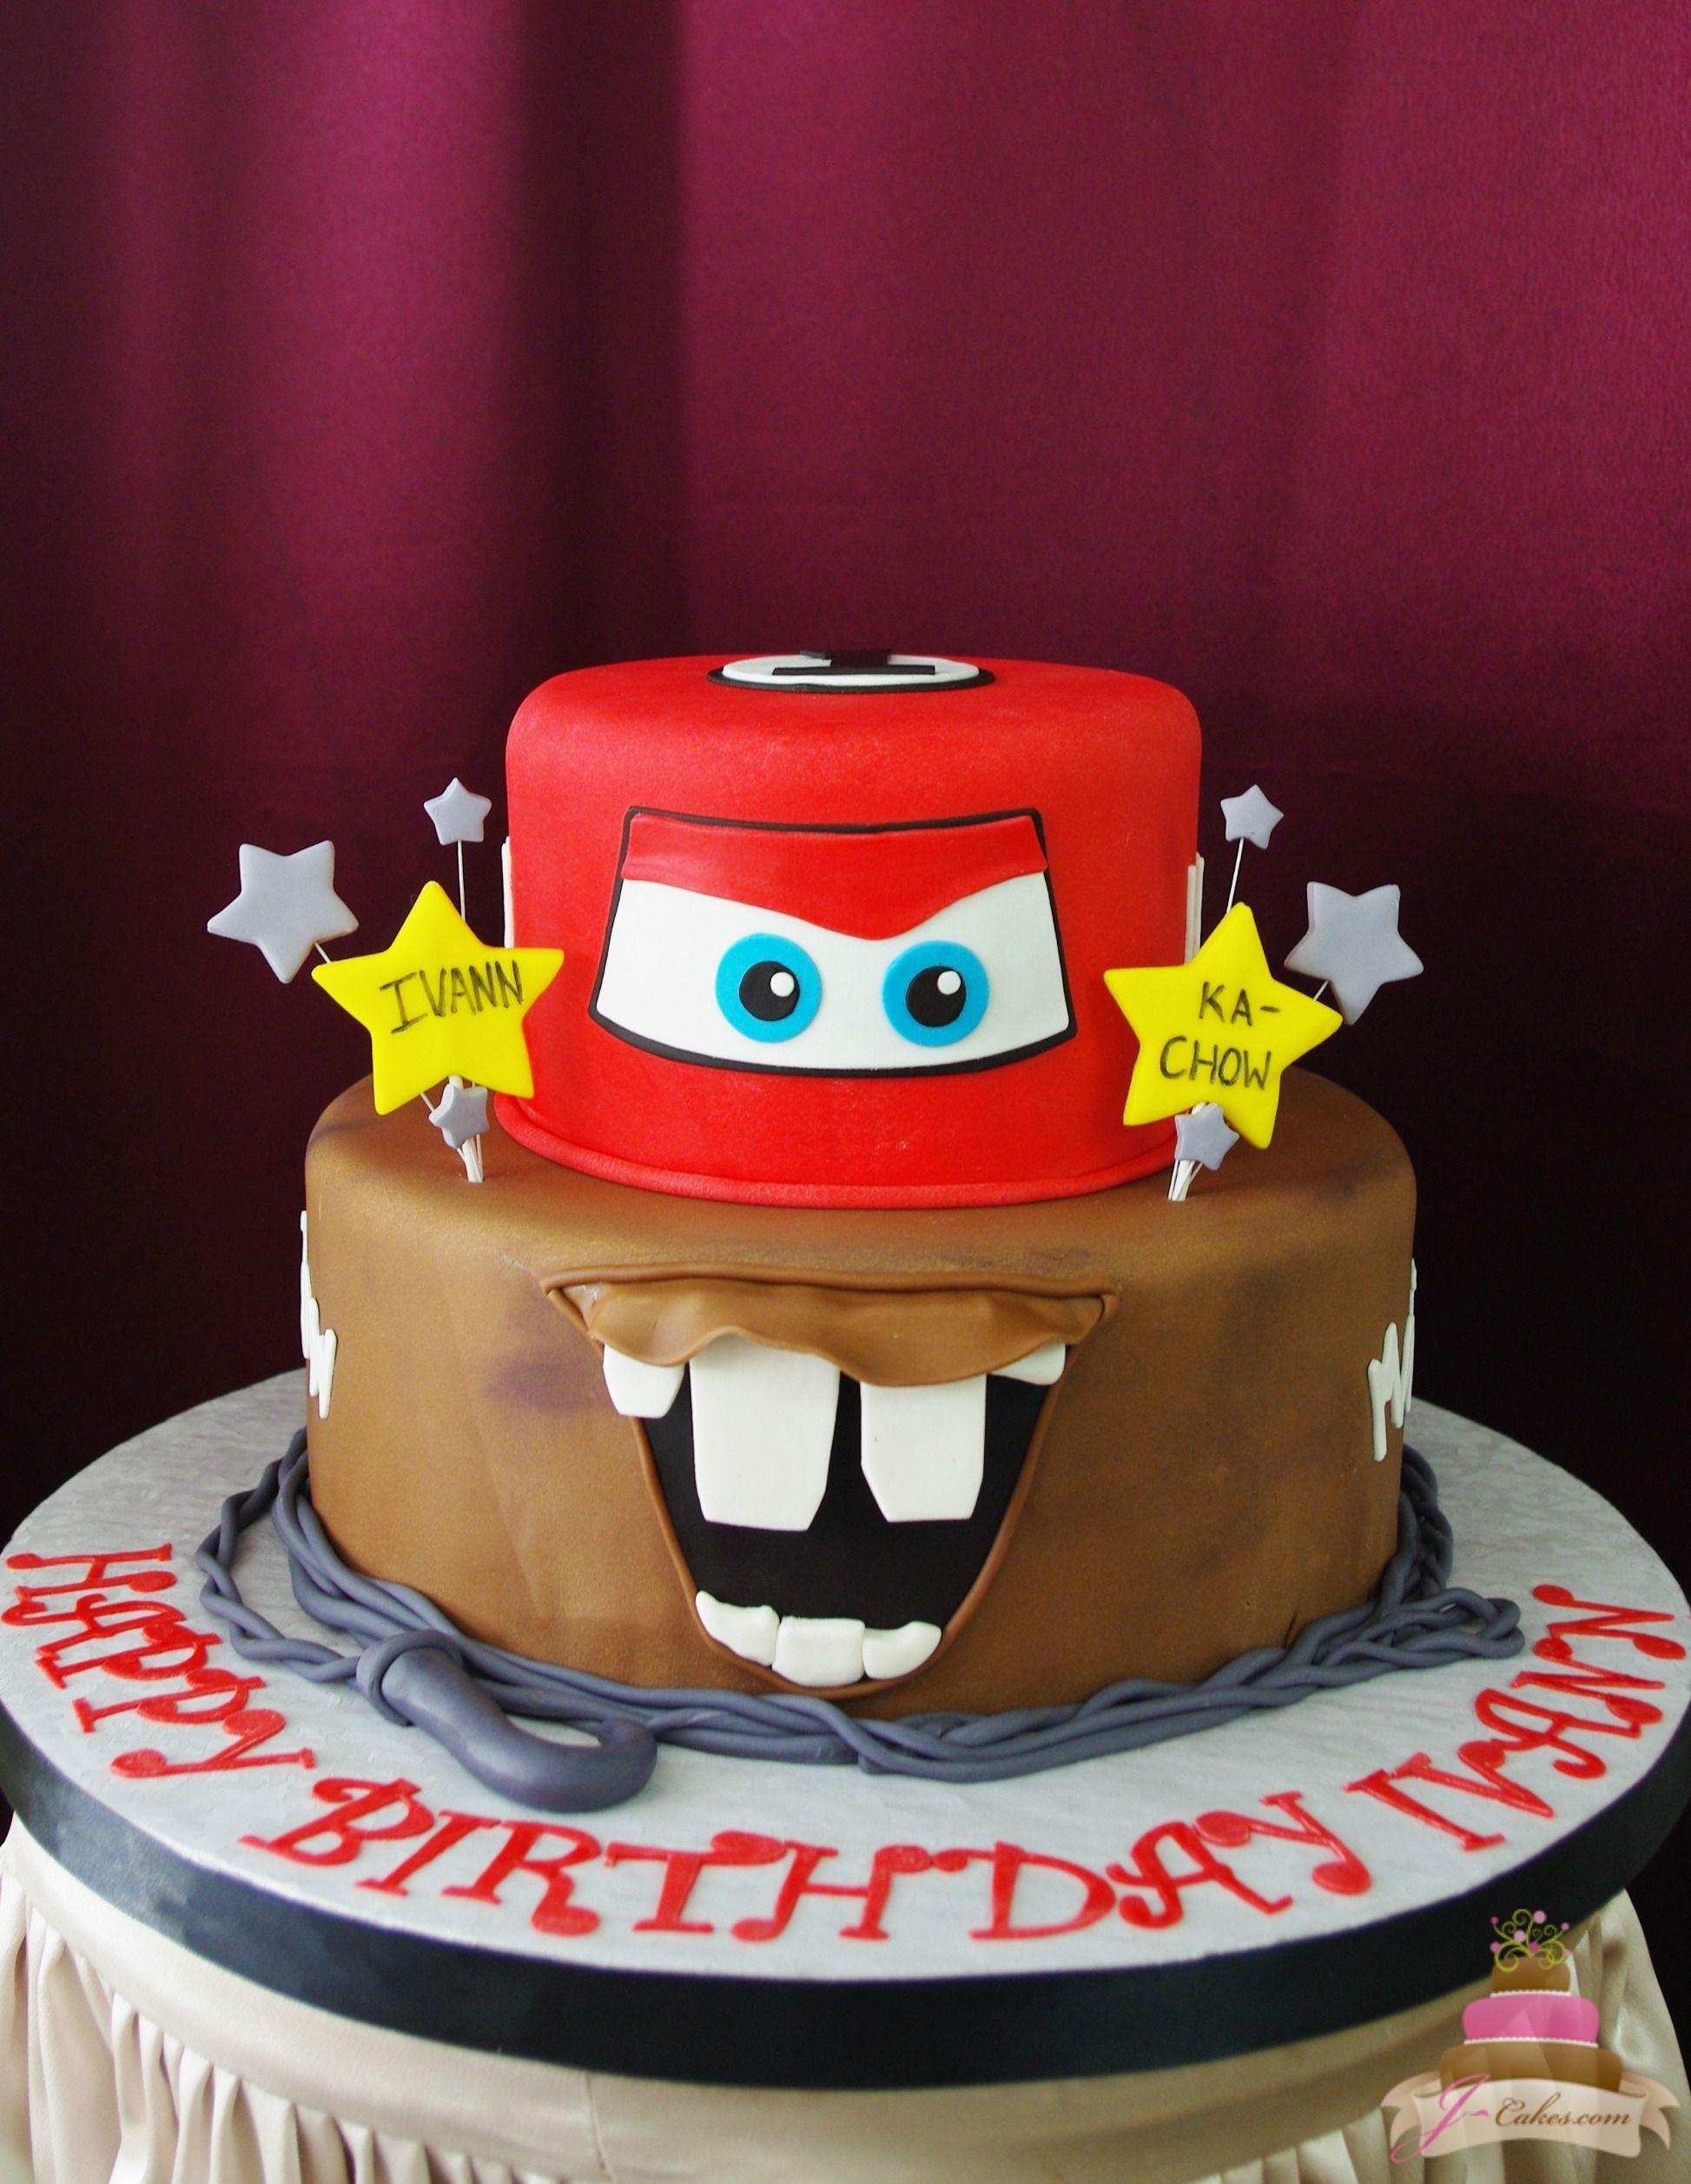 475 Cars Theme Cake Kids Cakes Pinterest Cars theme cake